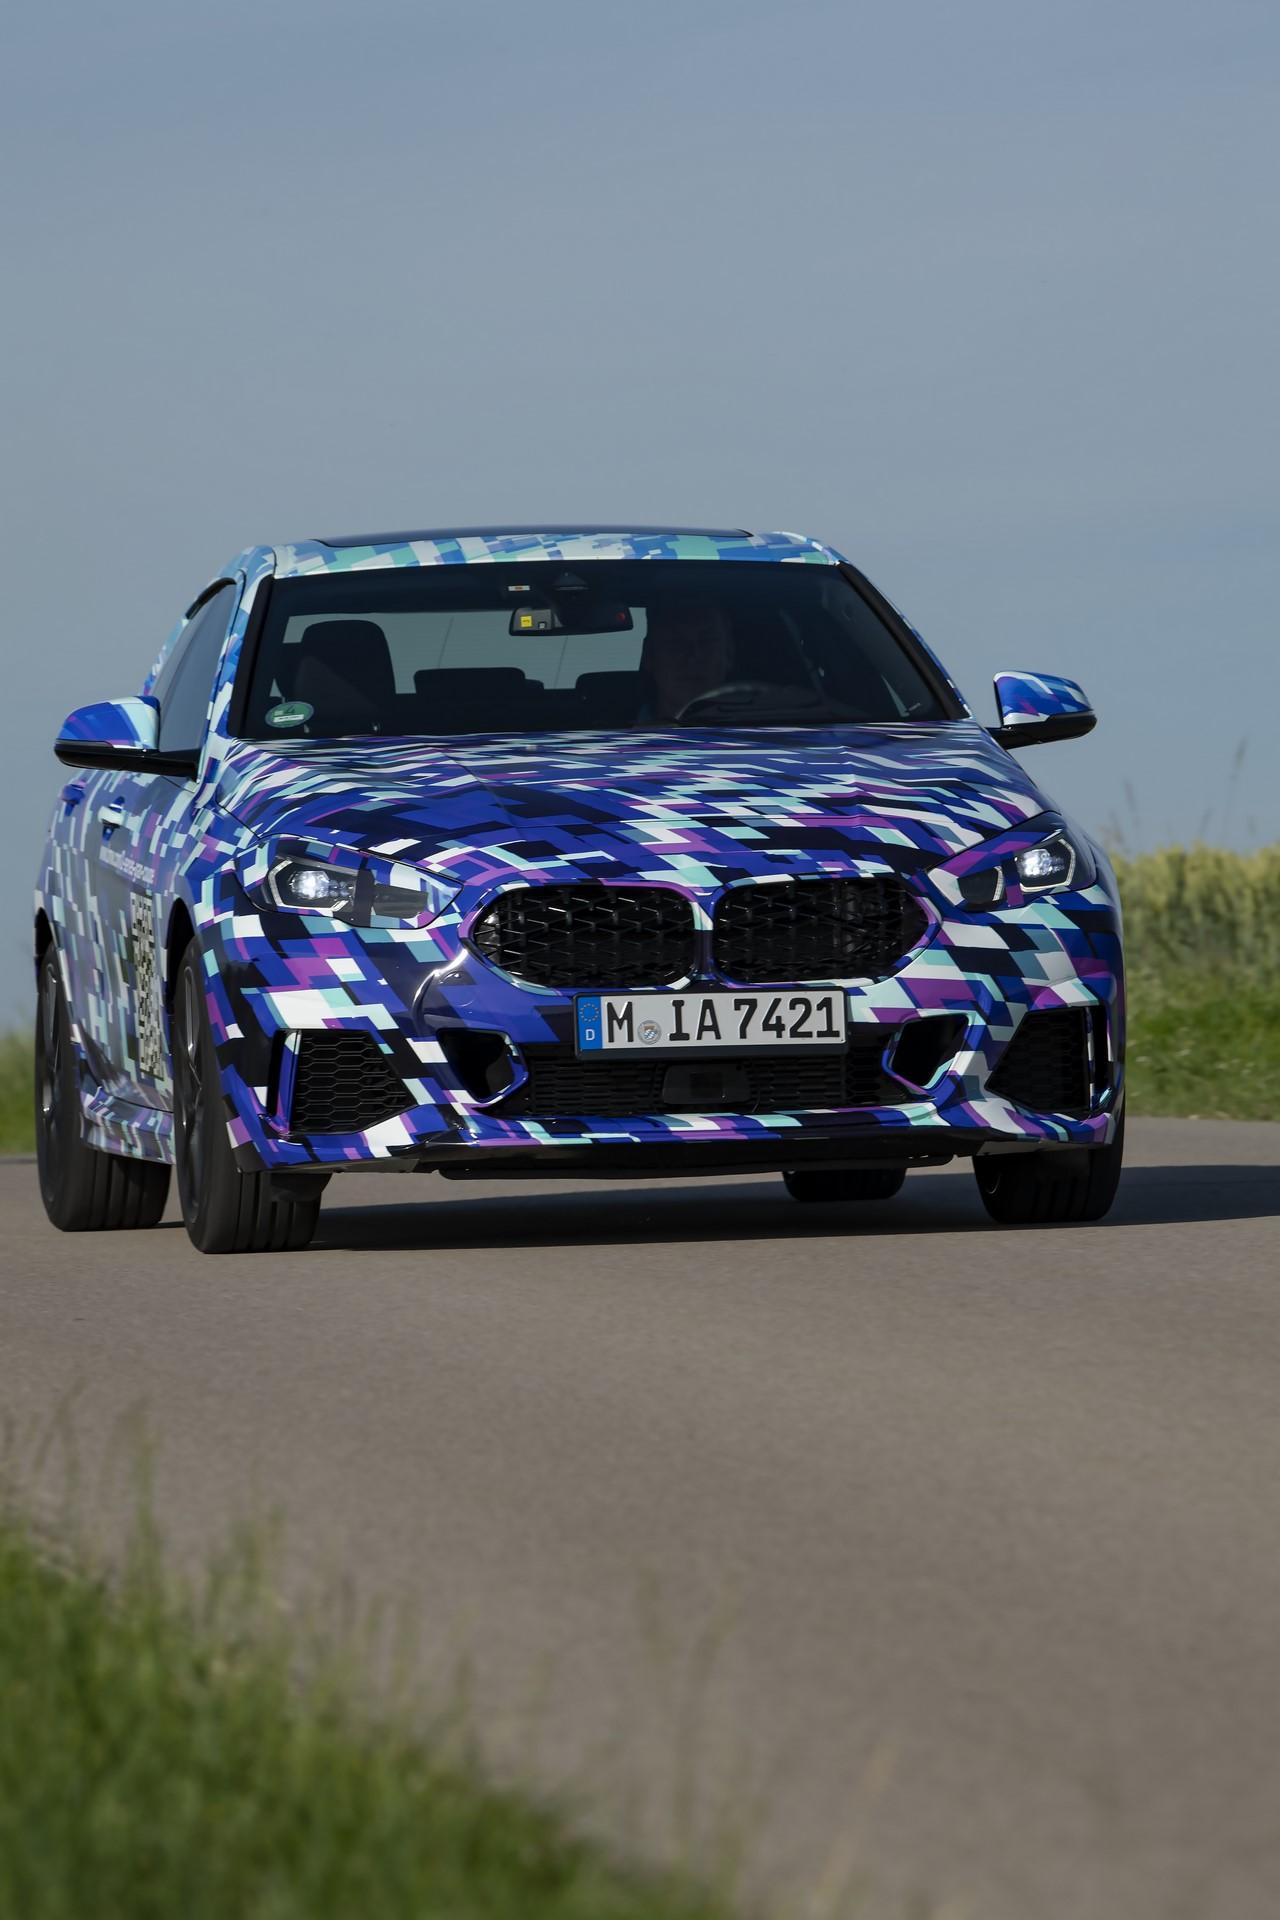 BMW-2-Series-Gran-Coupe-2020-spy-photos-4